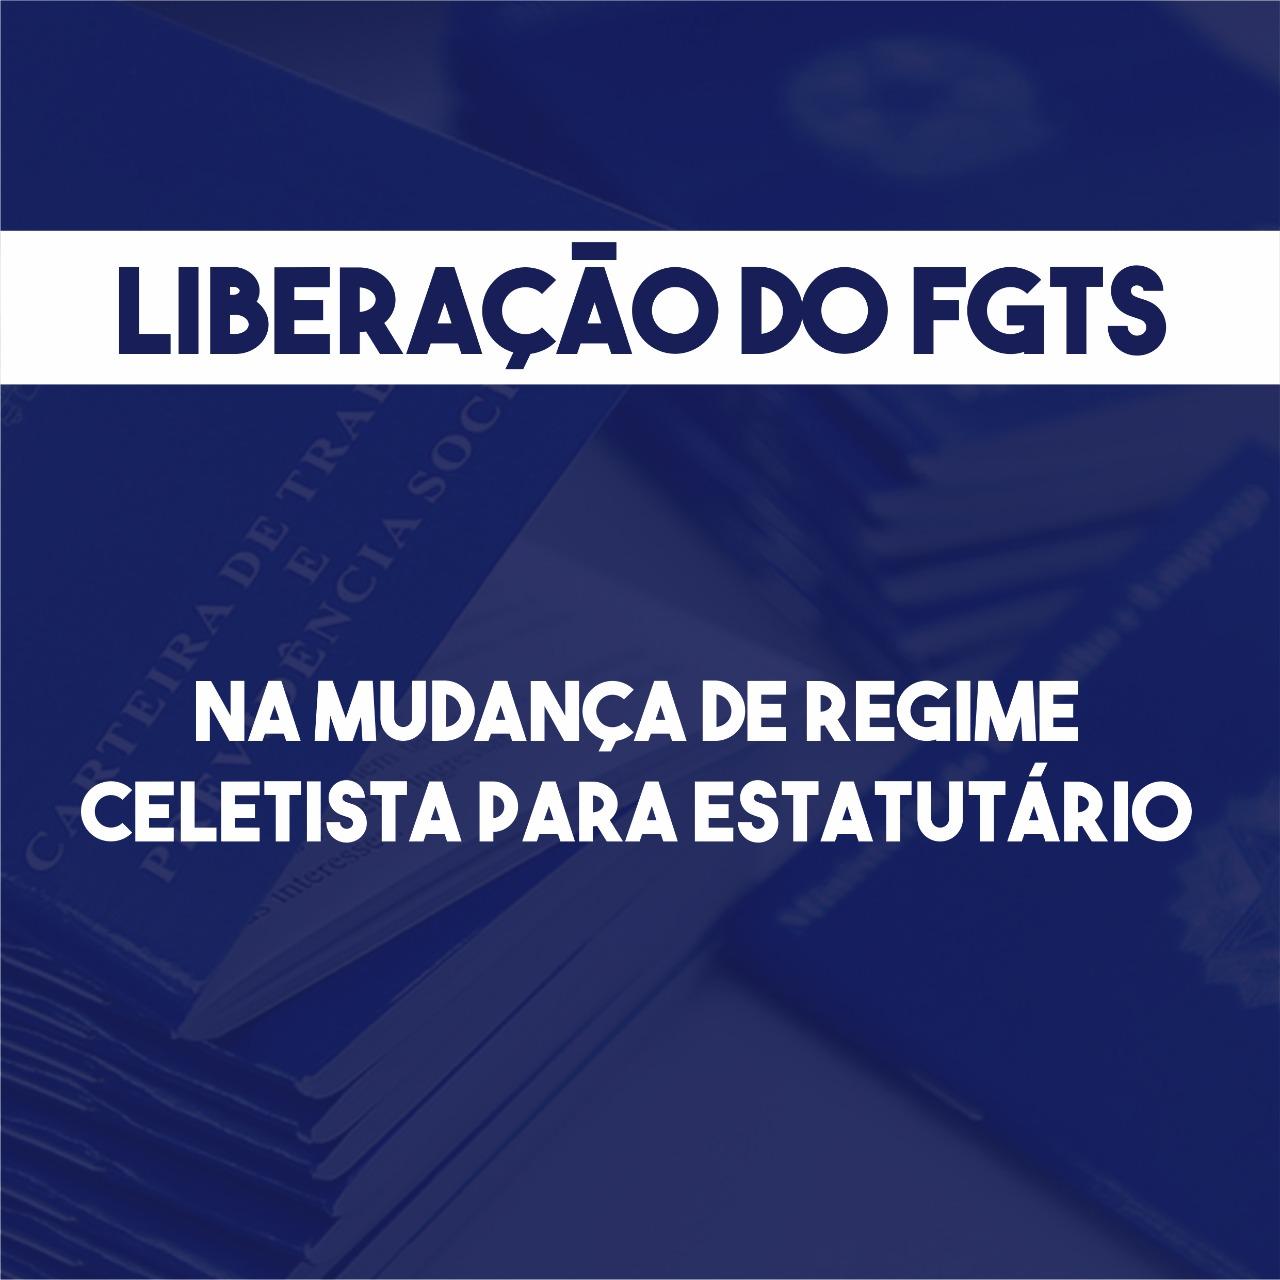 Sindicato garante FGTS para servidores que trocaram de regime em Sagres